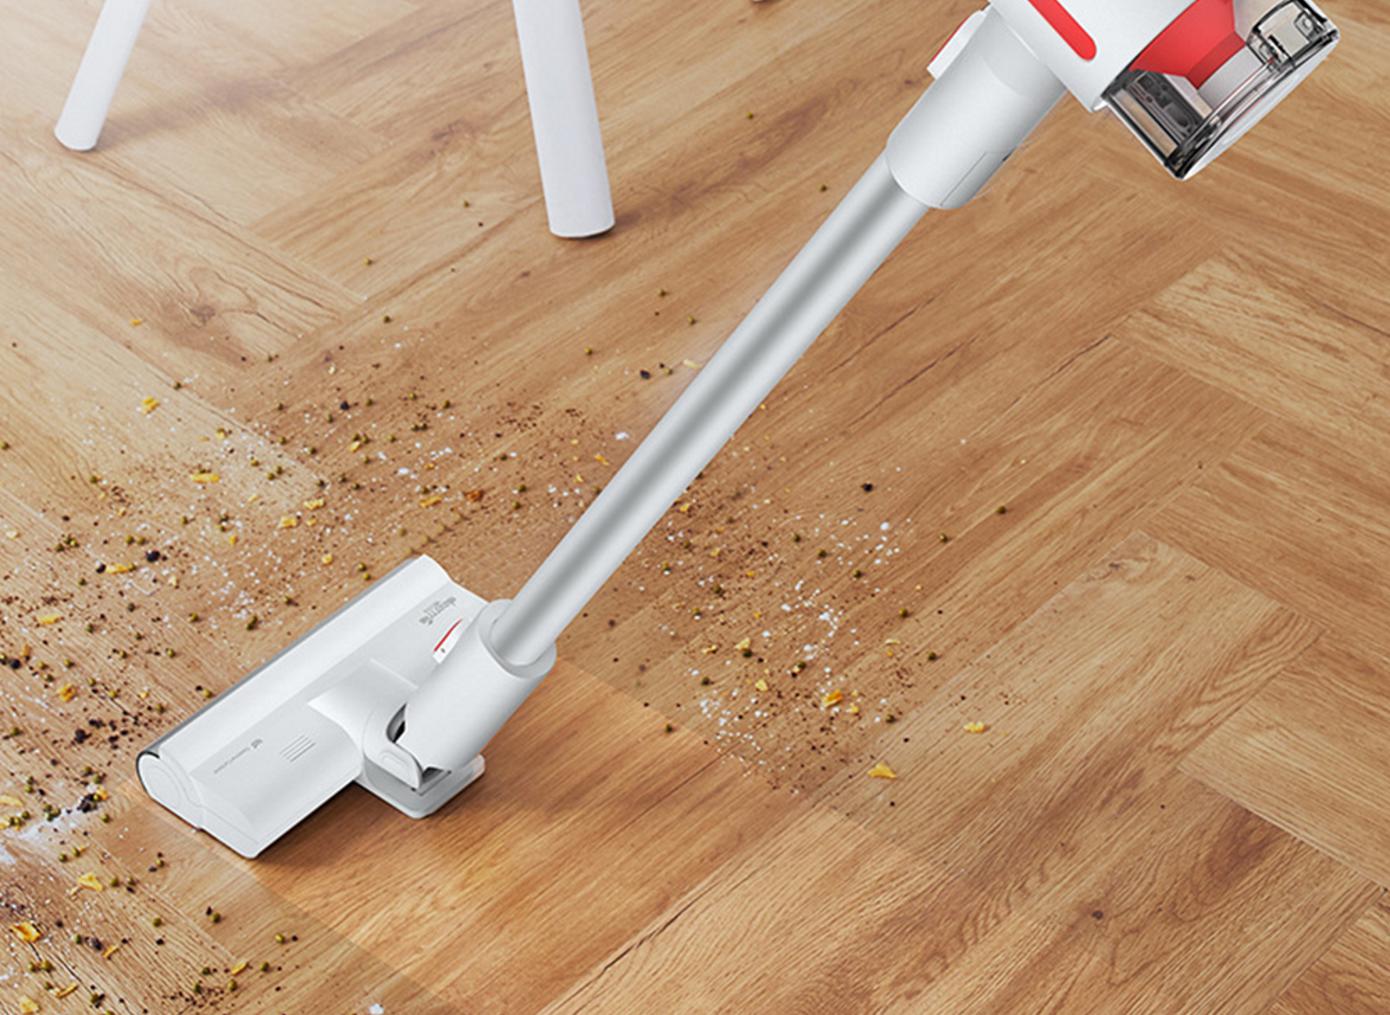 Opisanie Besprovodnoj Ruchnoj Pylesos Xiaomi Deerma Wireless Vacuum Cleaner Vc40 7